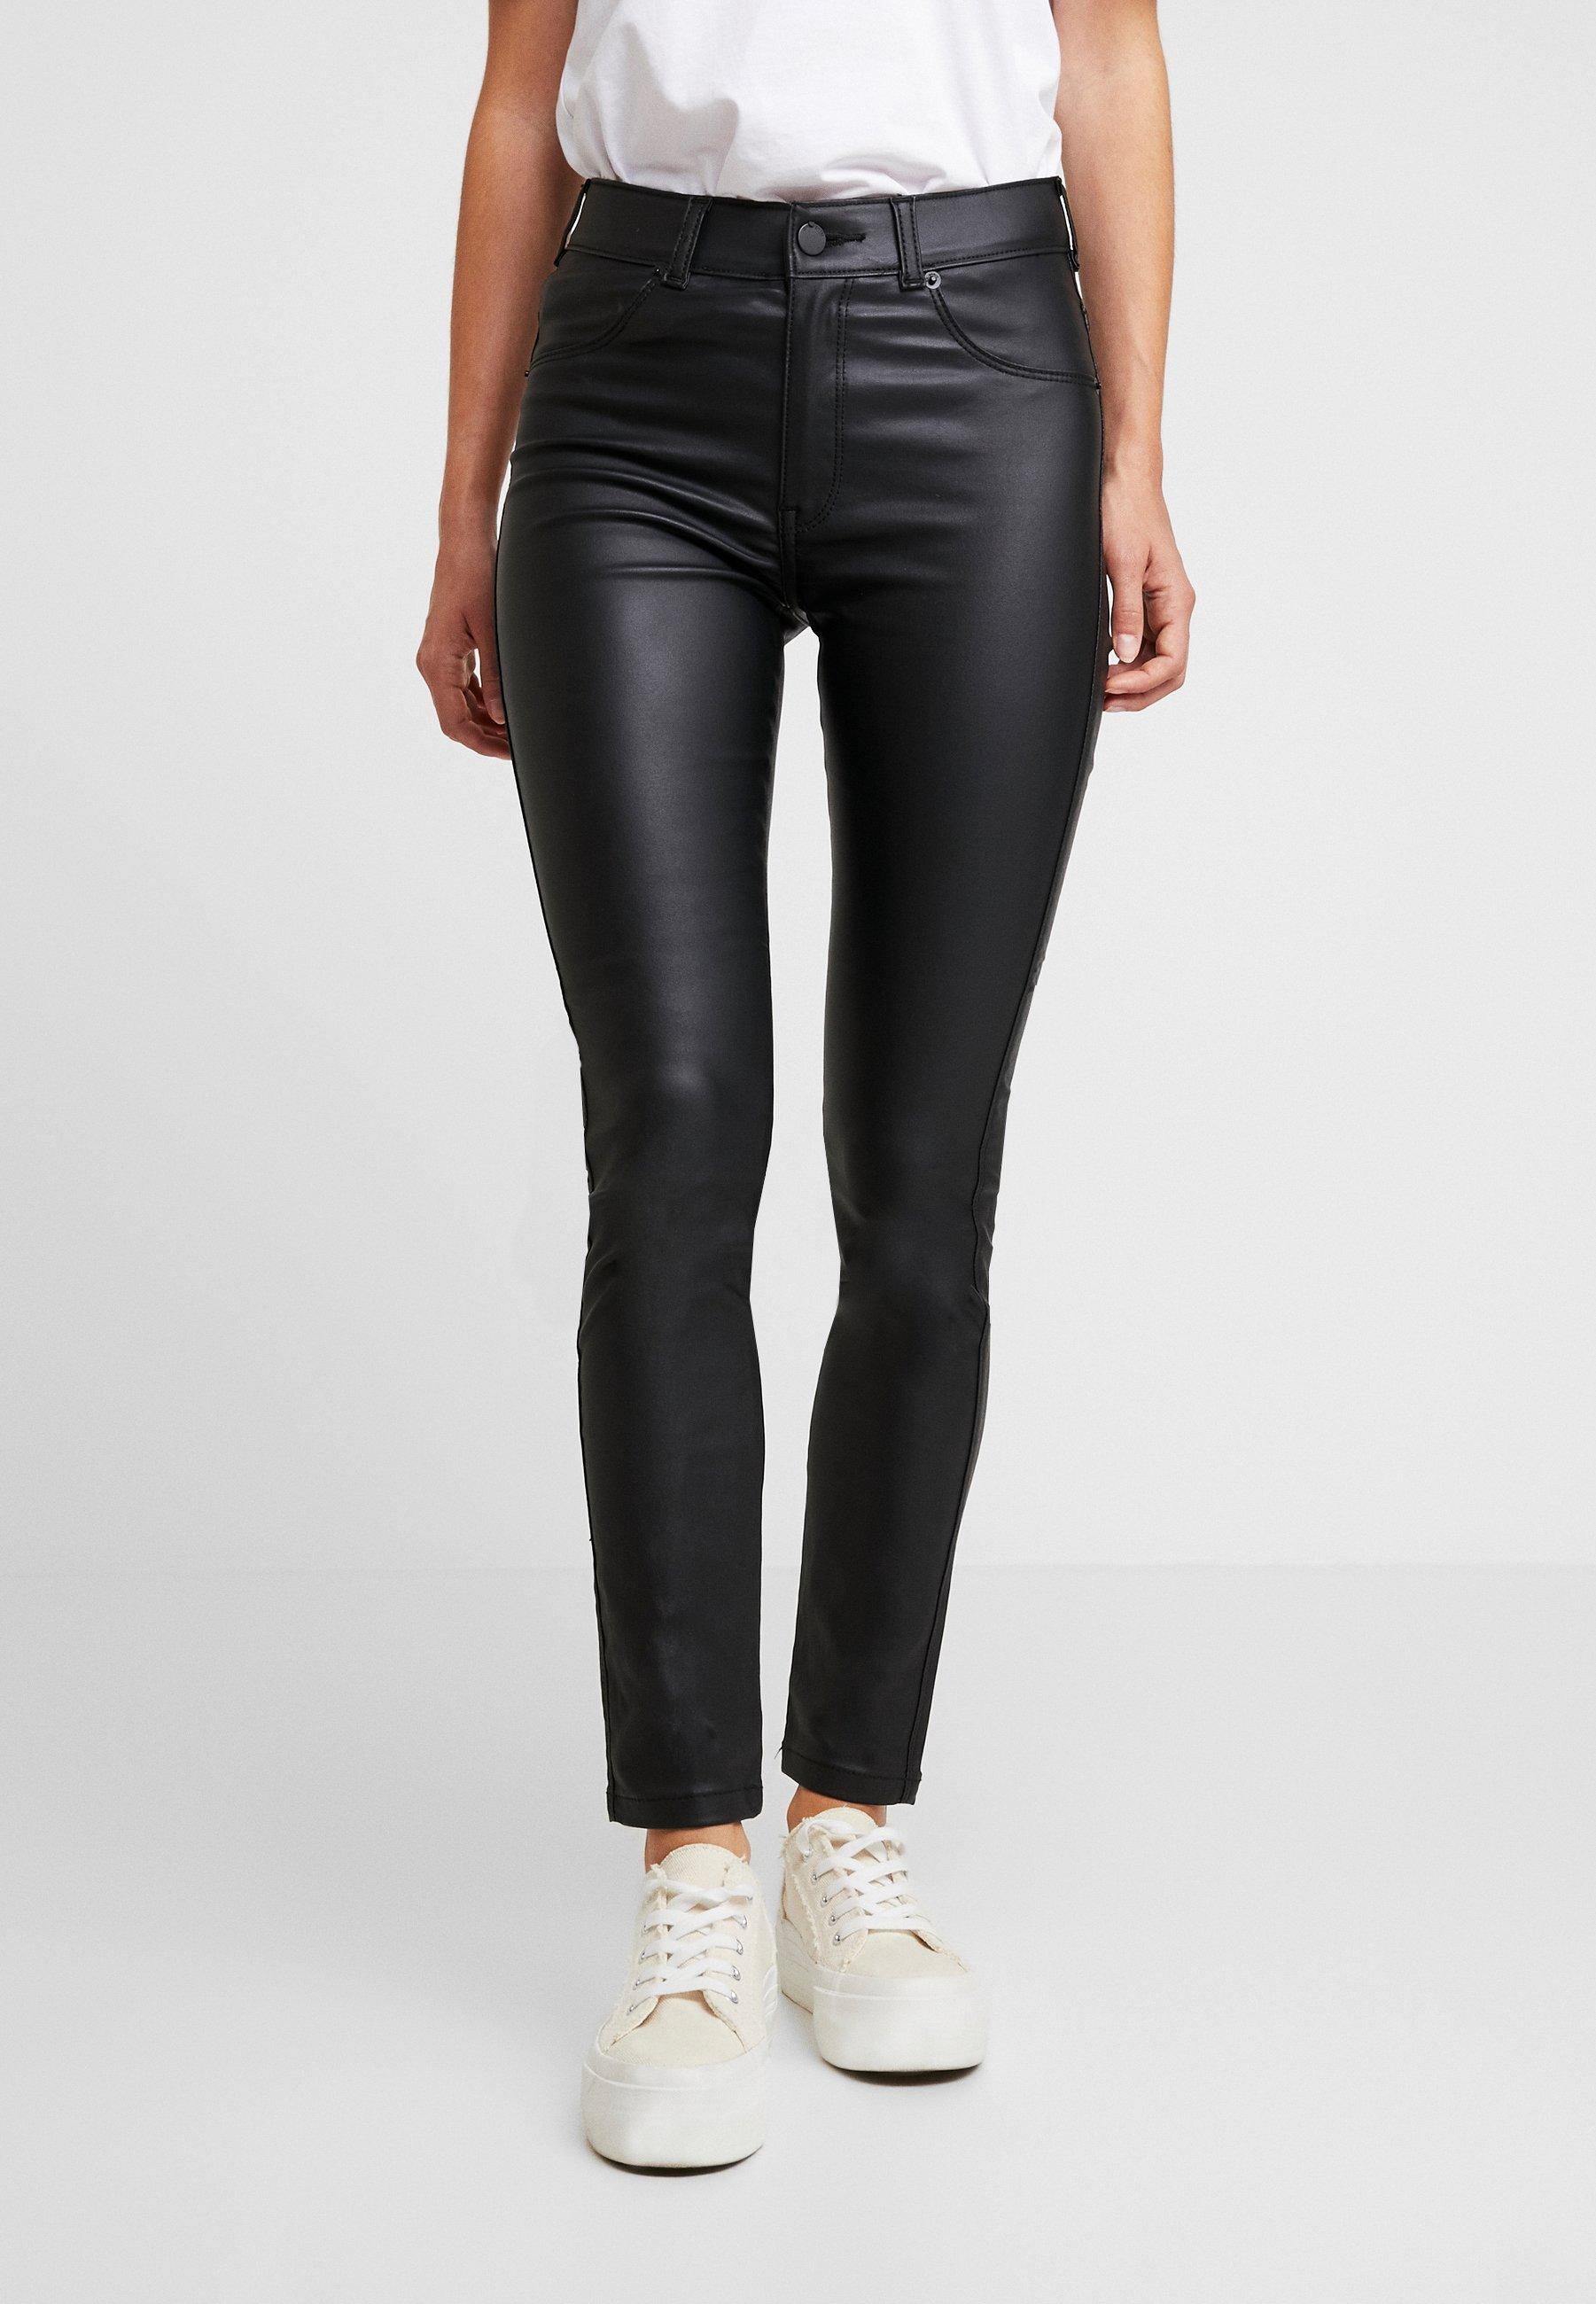 Dr.Denim Petite PLENTY - Jeans Skinny Fit black metal